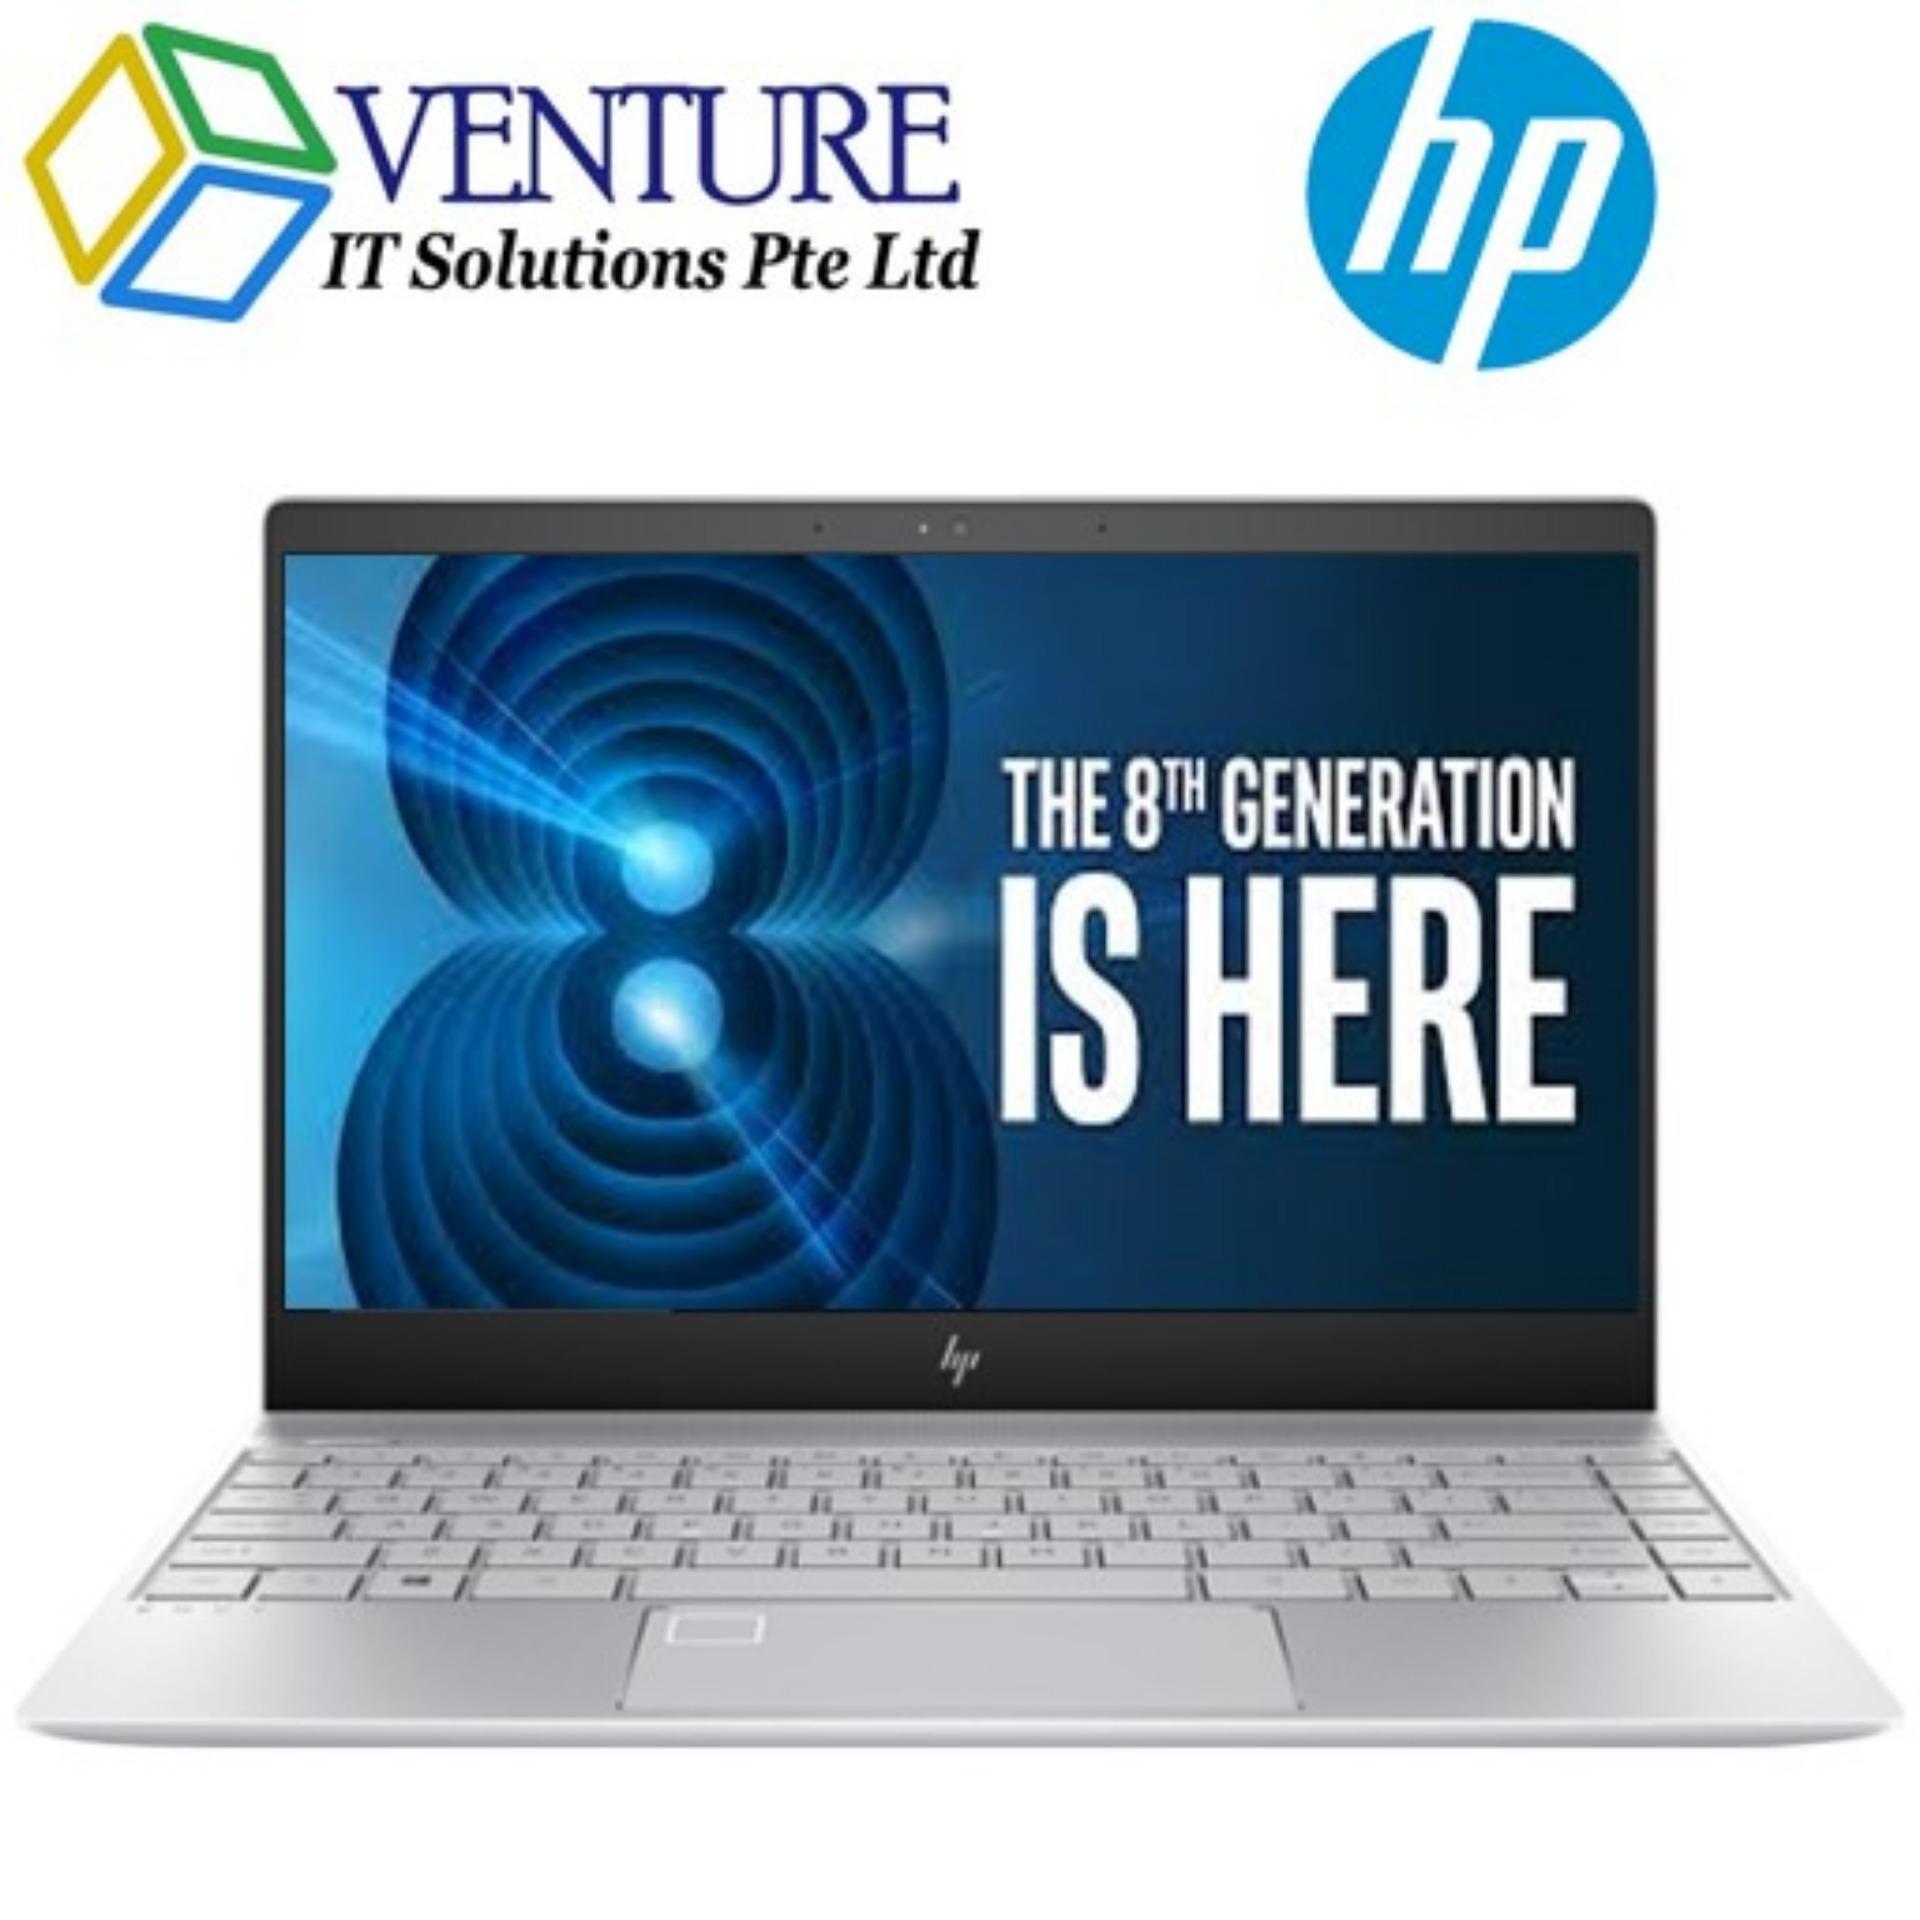 [NEW 8TH GEN] HP ENVY 13 AD115TU i5-8250U 8GB 256SSD 13.3″ FHD WIN10